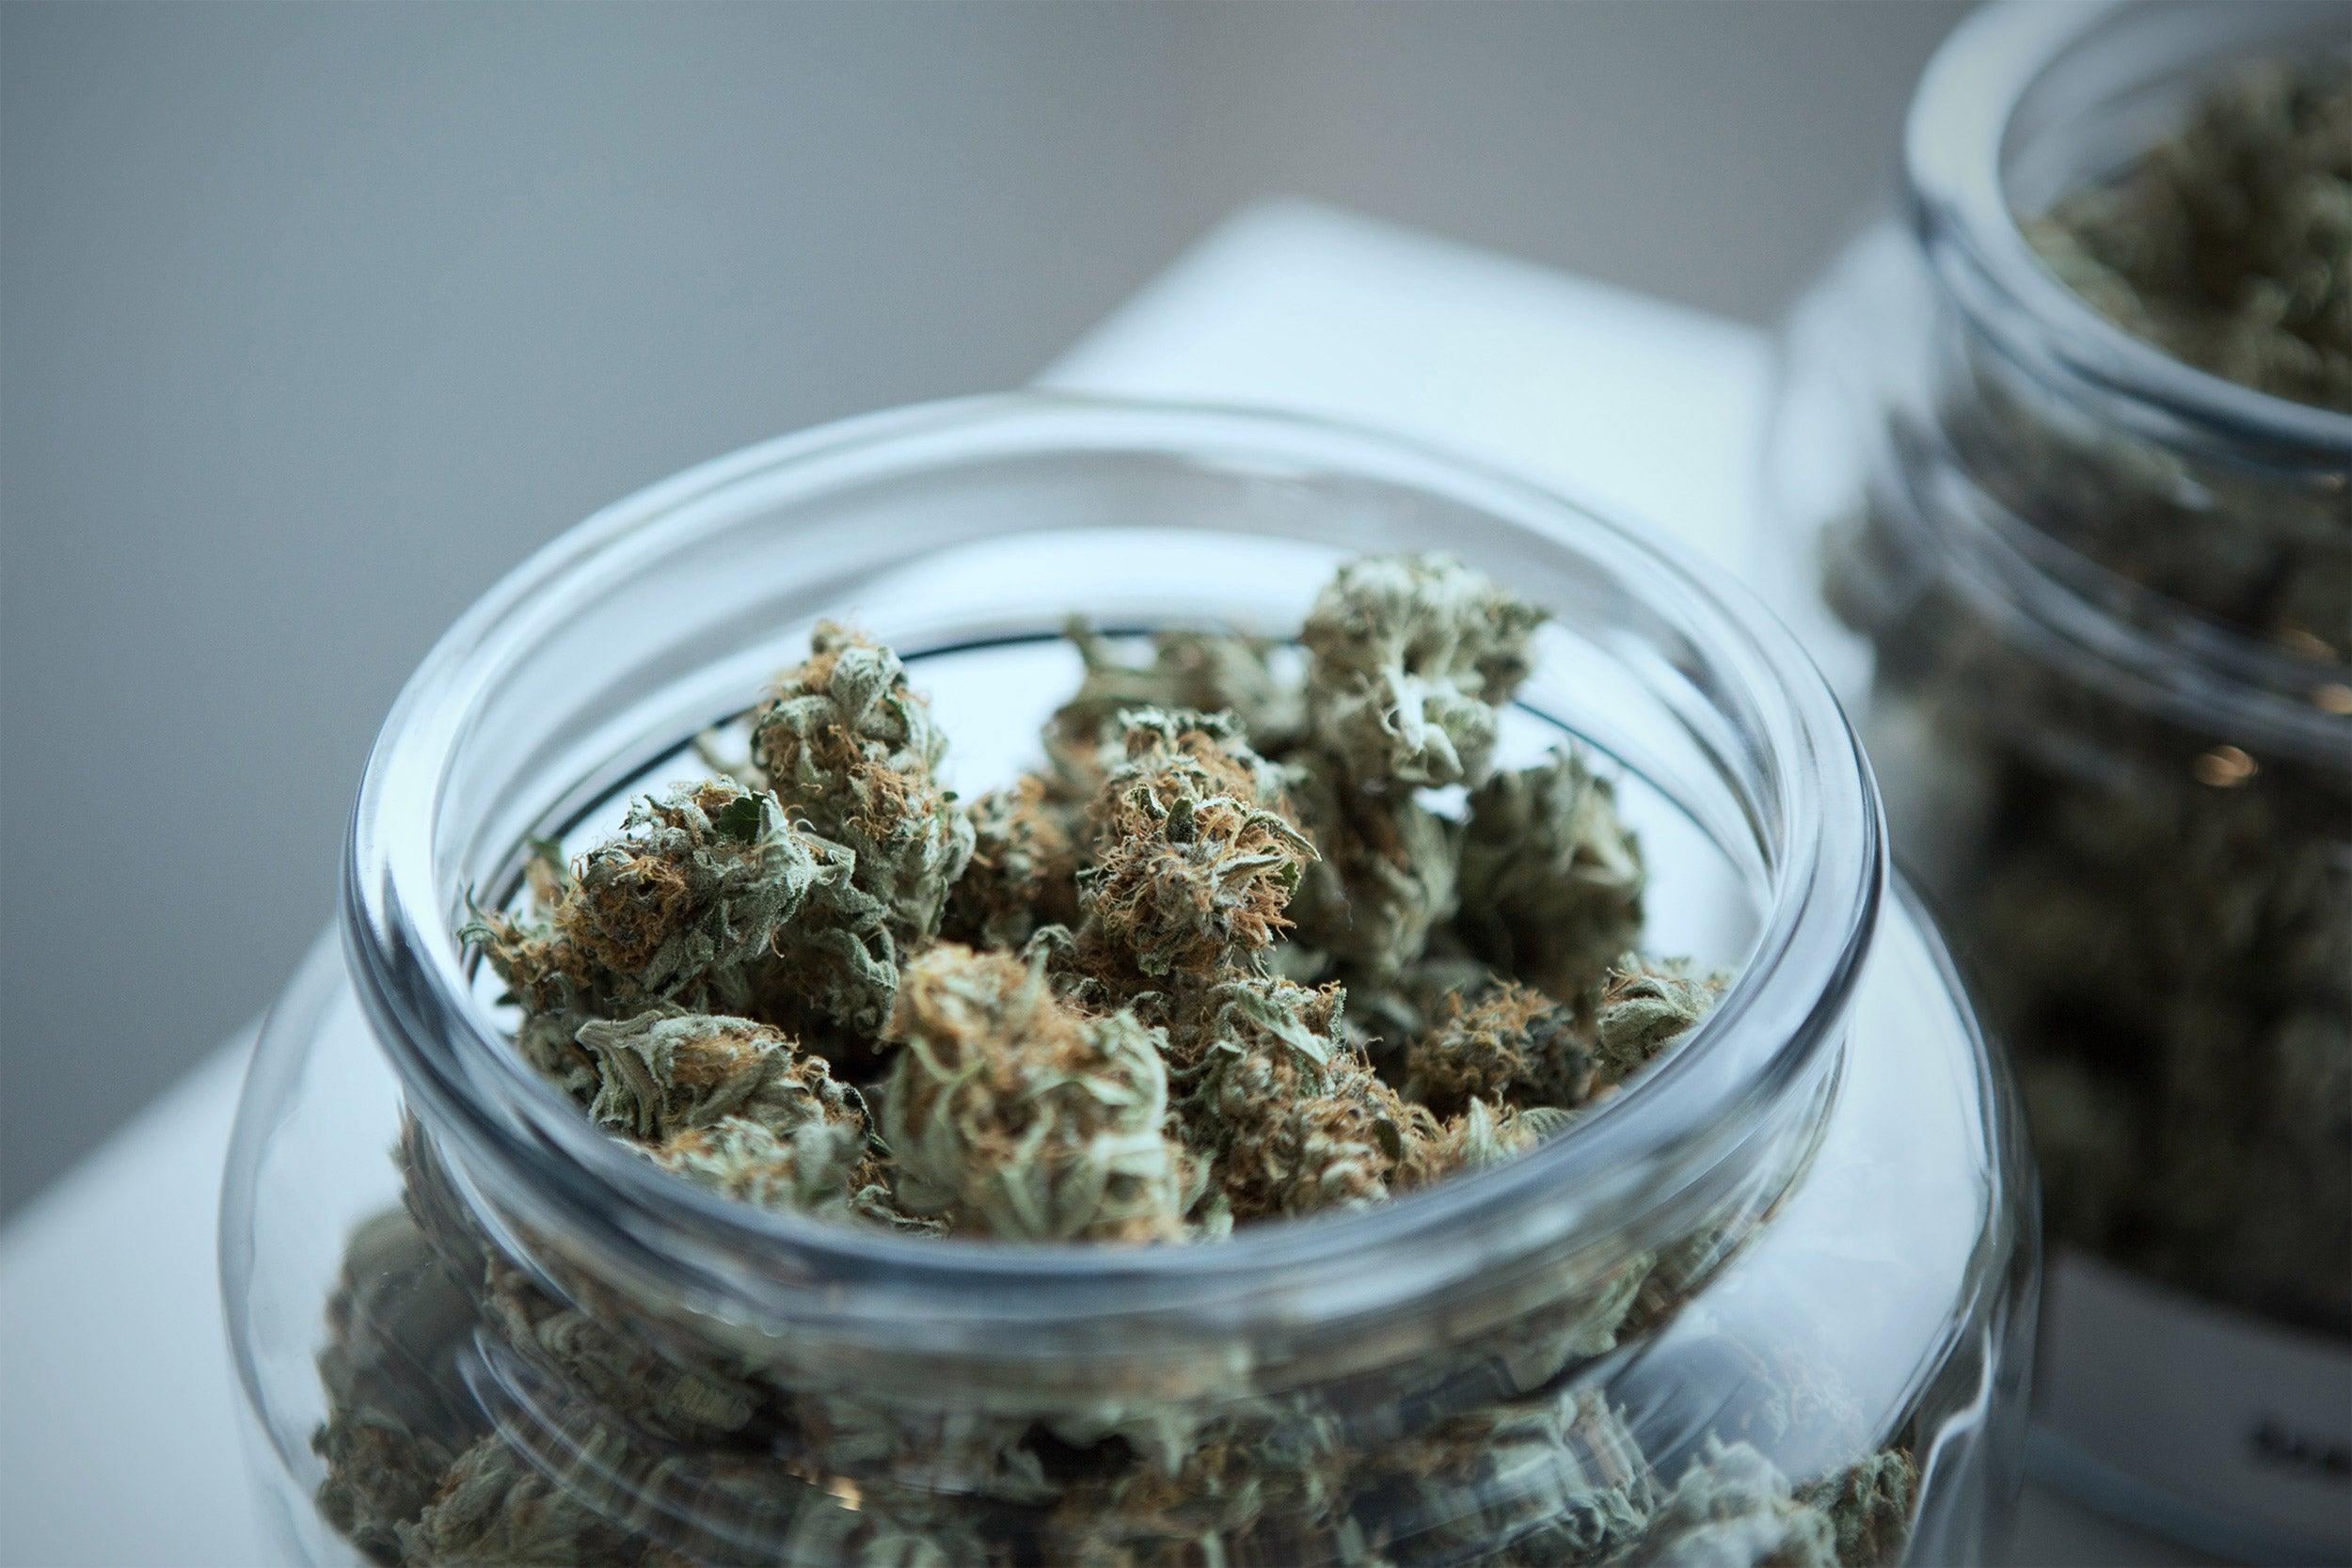 A jar with marijuana in it.